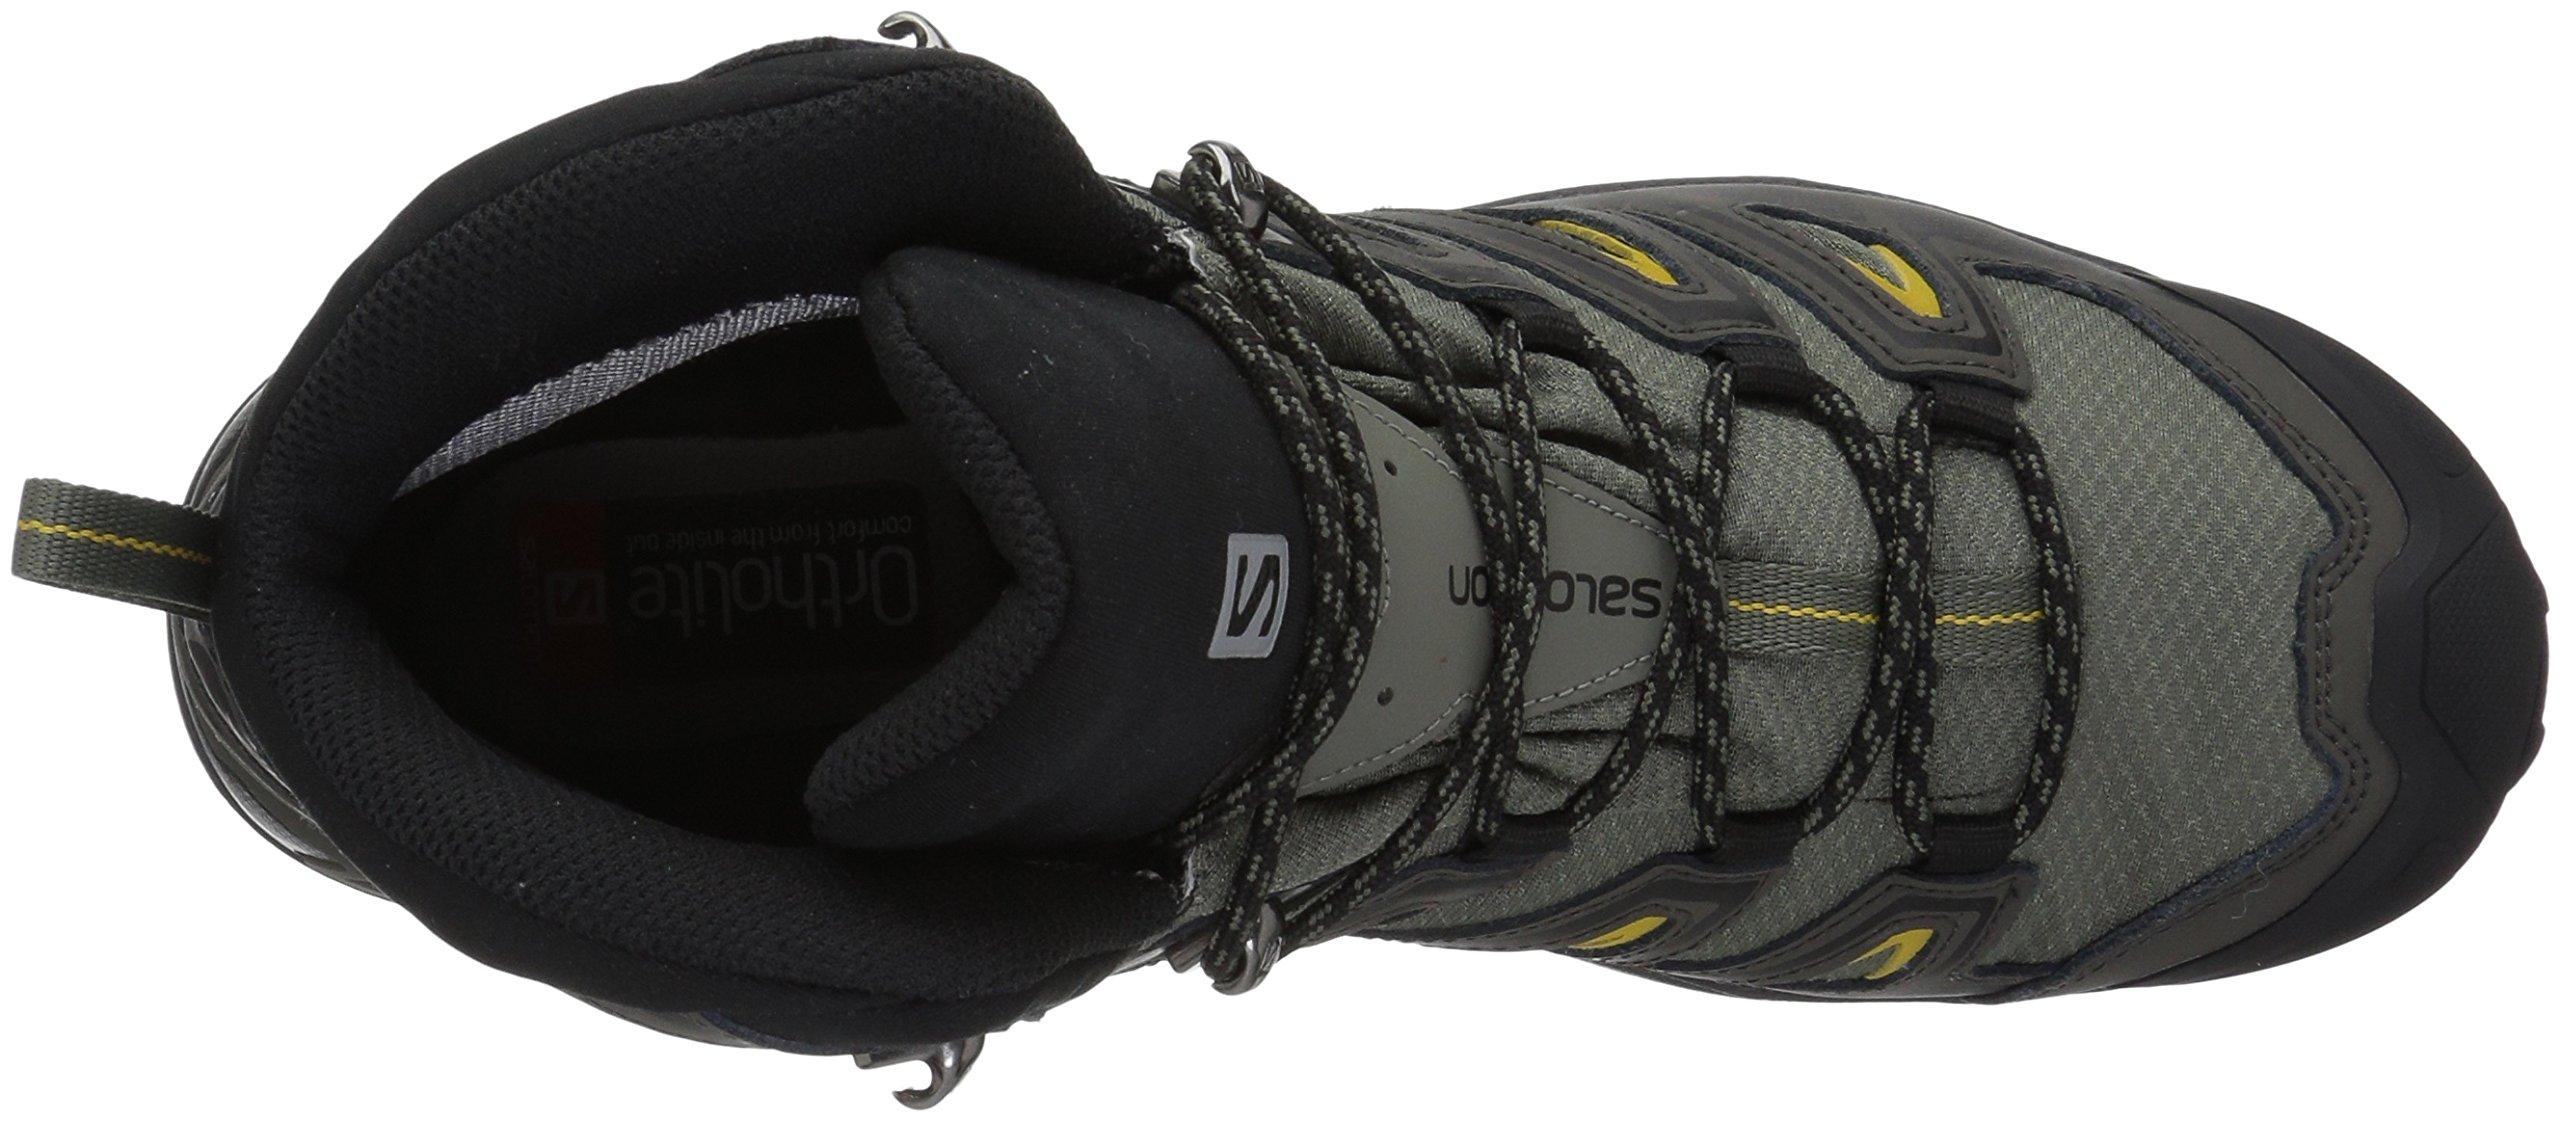 online retailer 60995 5a46a Salomon Men's X Ultra 3 Wide Mid GTX Hiking Boots < Hiking ...